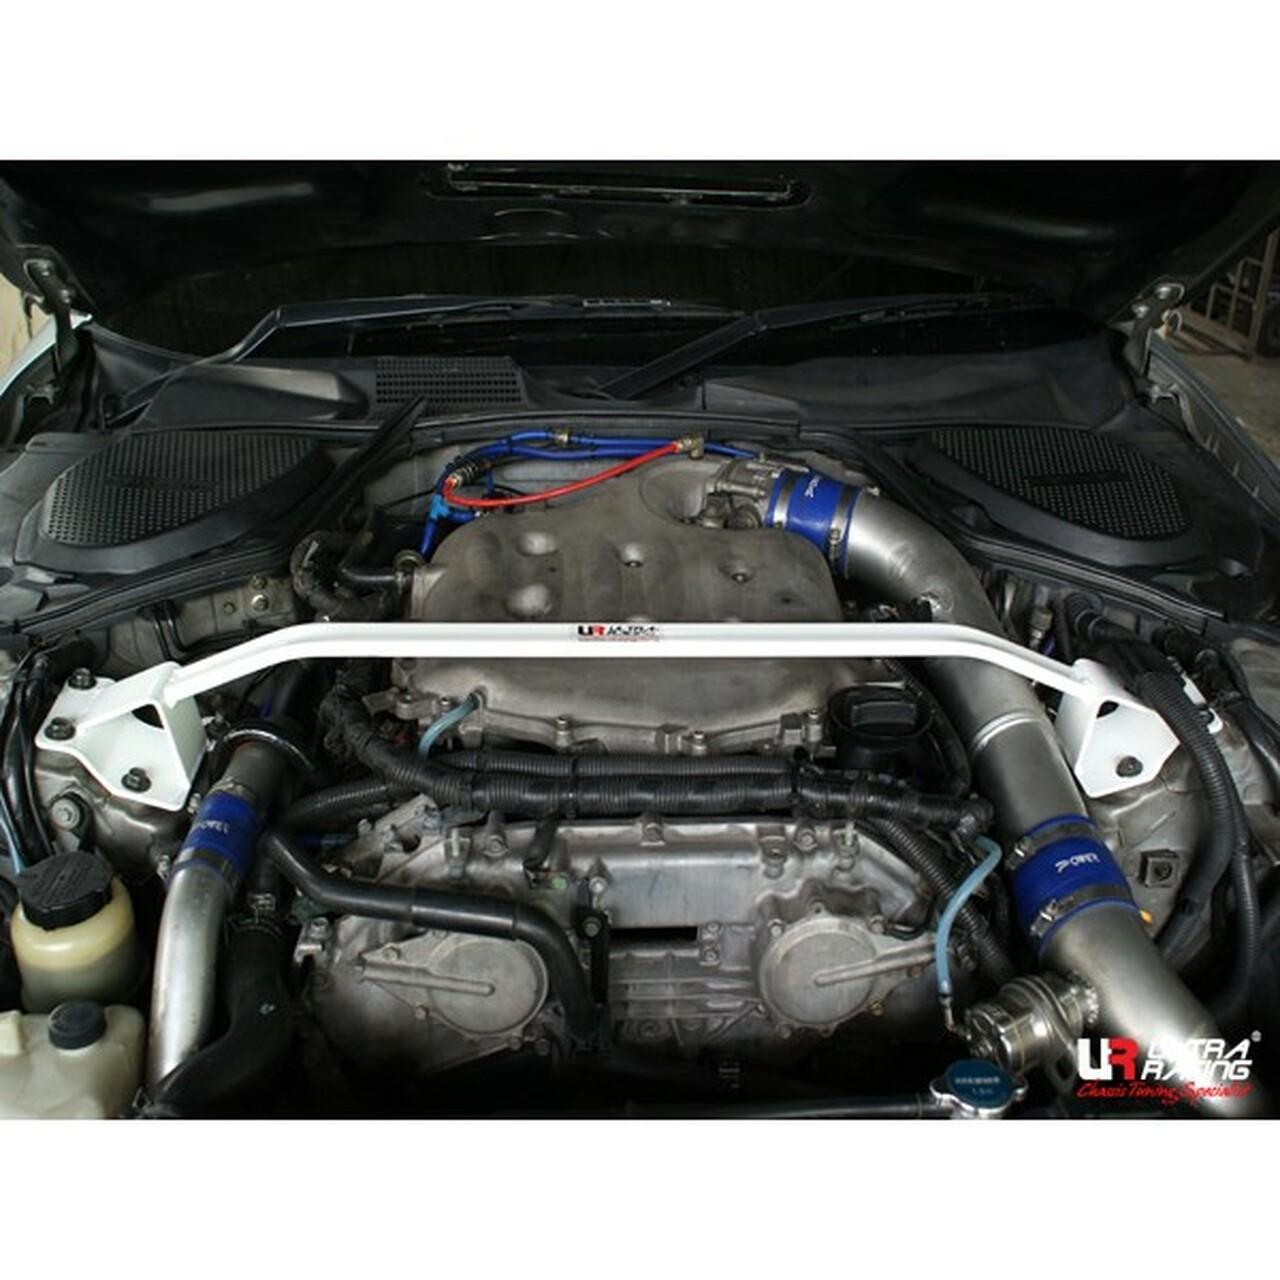 Ultra Racing Front Strut Bar Nissan 350Z UR-TW2-1255